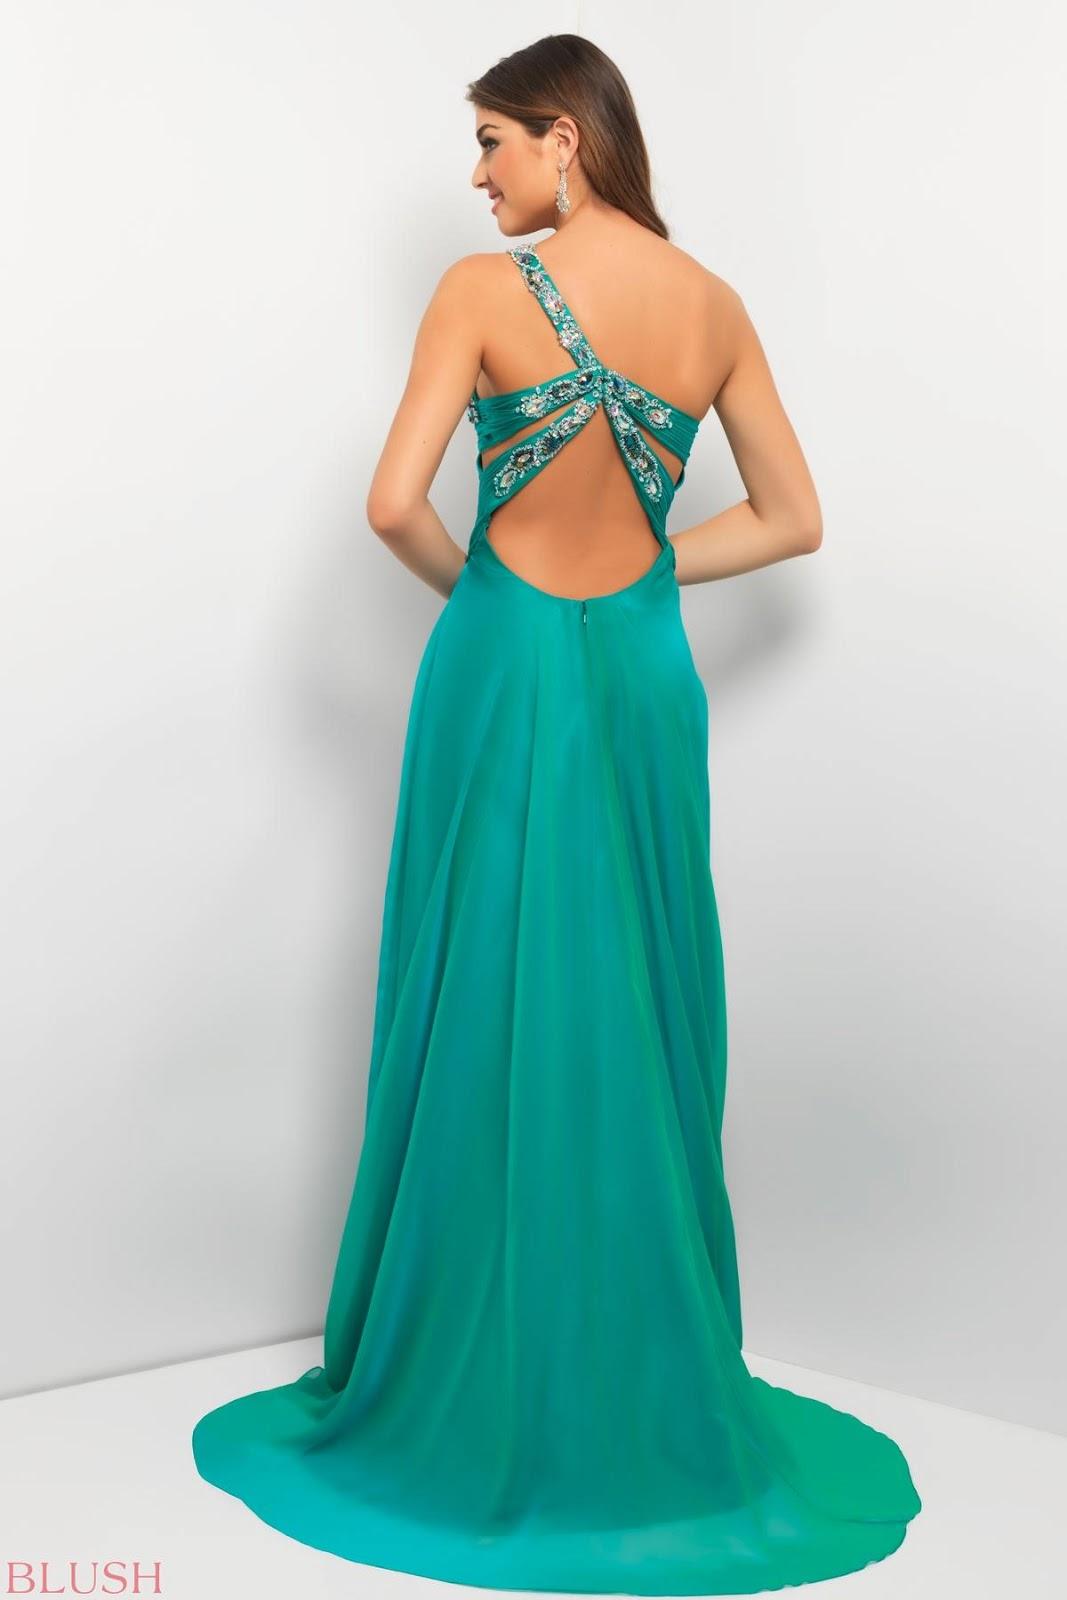 Prom Dresses 2013 | Fashion Party Prom Dresses Online Blog